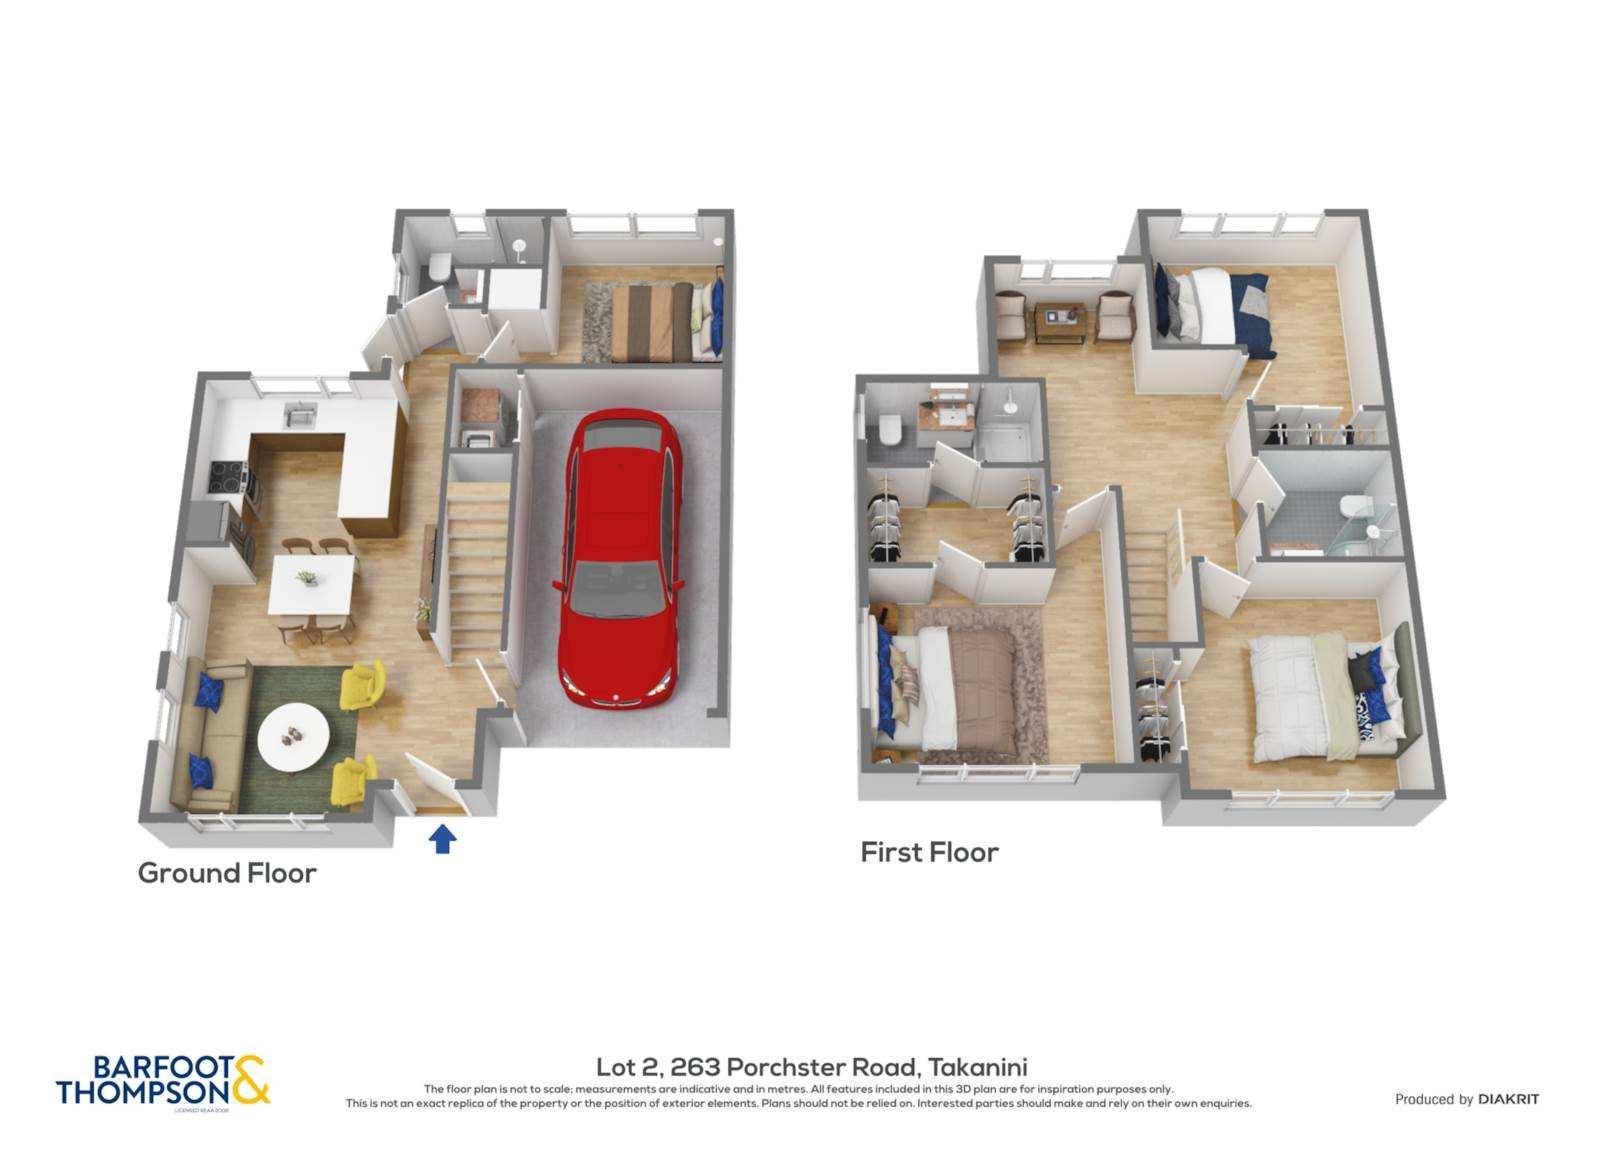 Takanini 4房 全新独立城市屋 高品质高规格 靠近商店&火车站 首付仅需5% 首房/投资完美选择! BRAND NEW STANDALONE FAMILY HOMES!